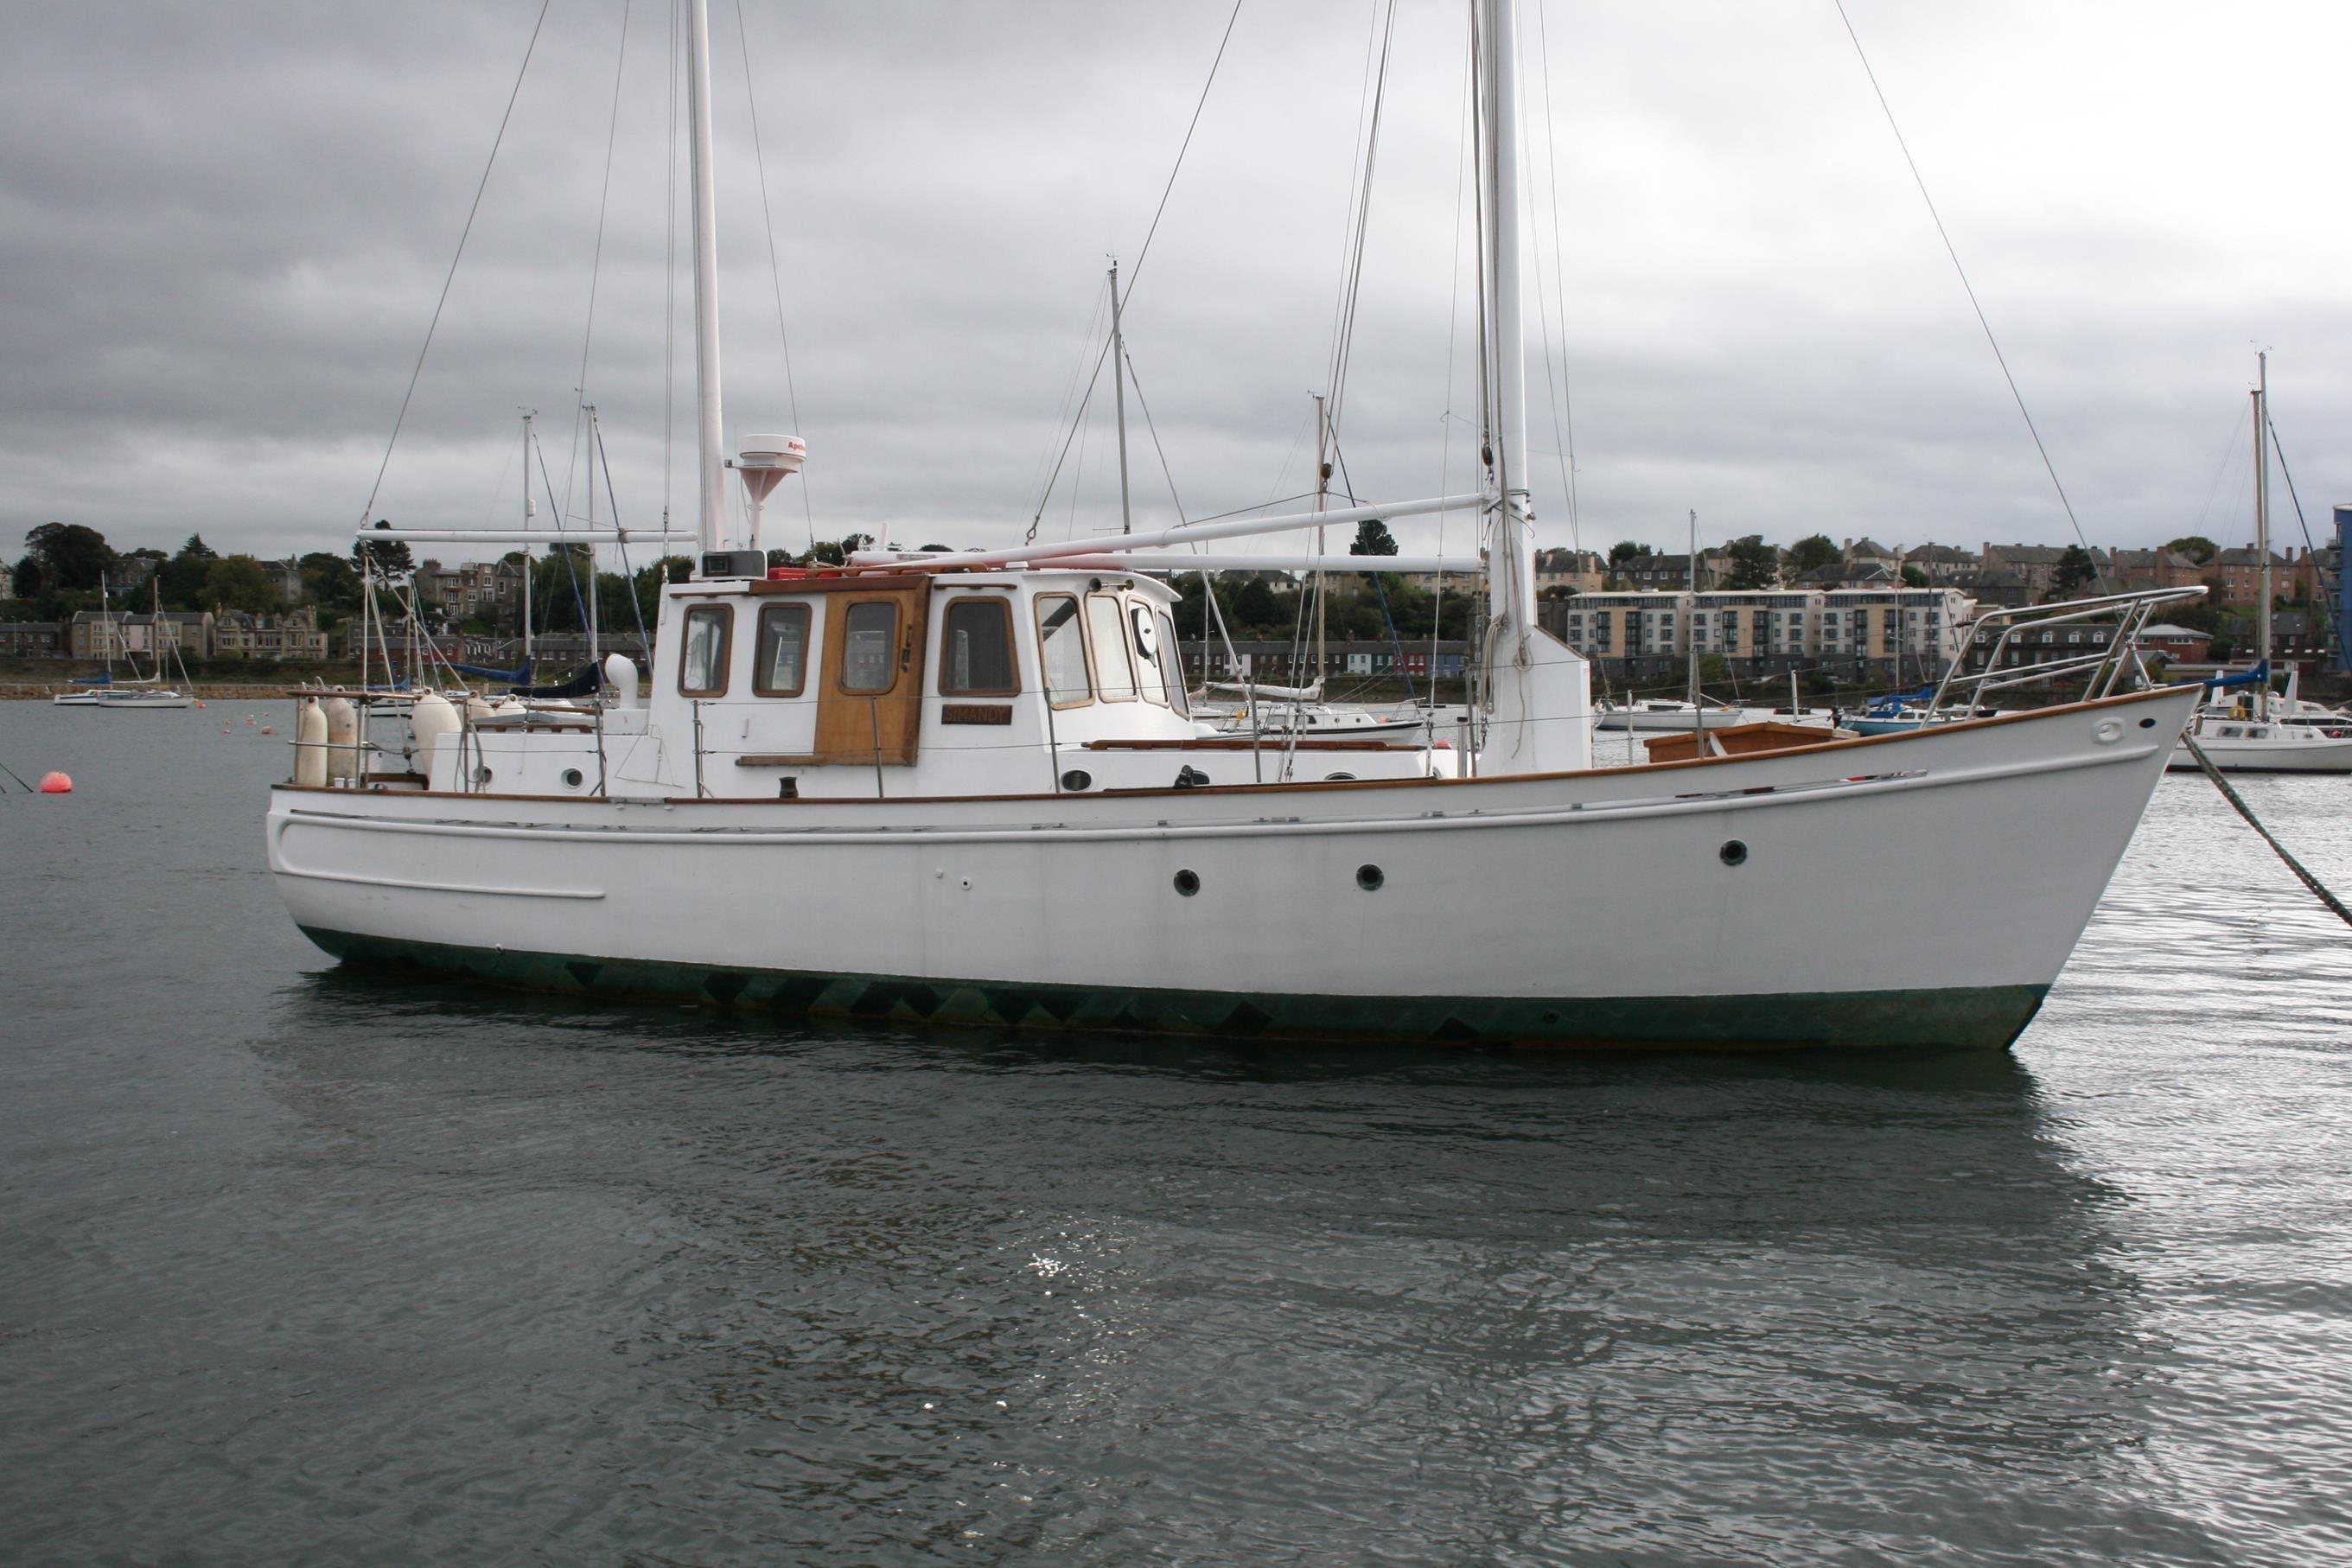 1964 Sole Bay Ketch Motor Sailer Sail Boat For Sale Www